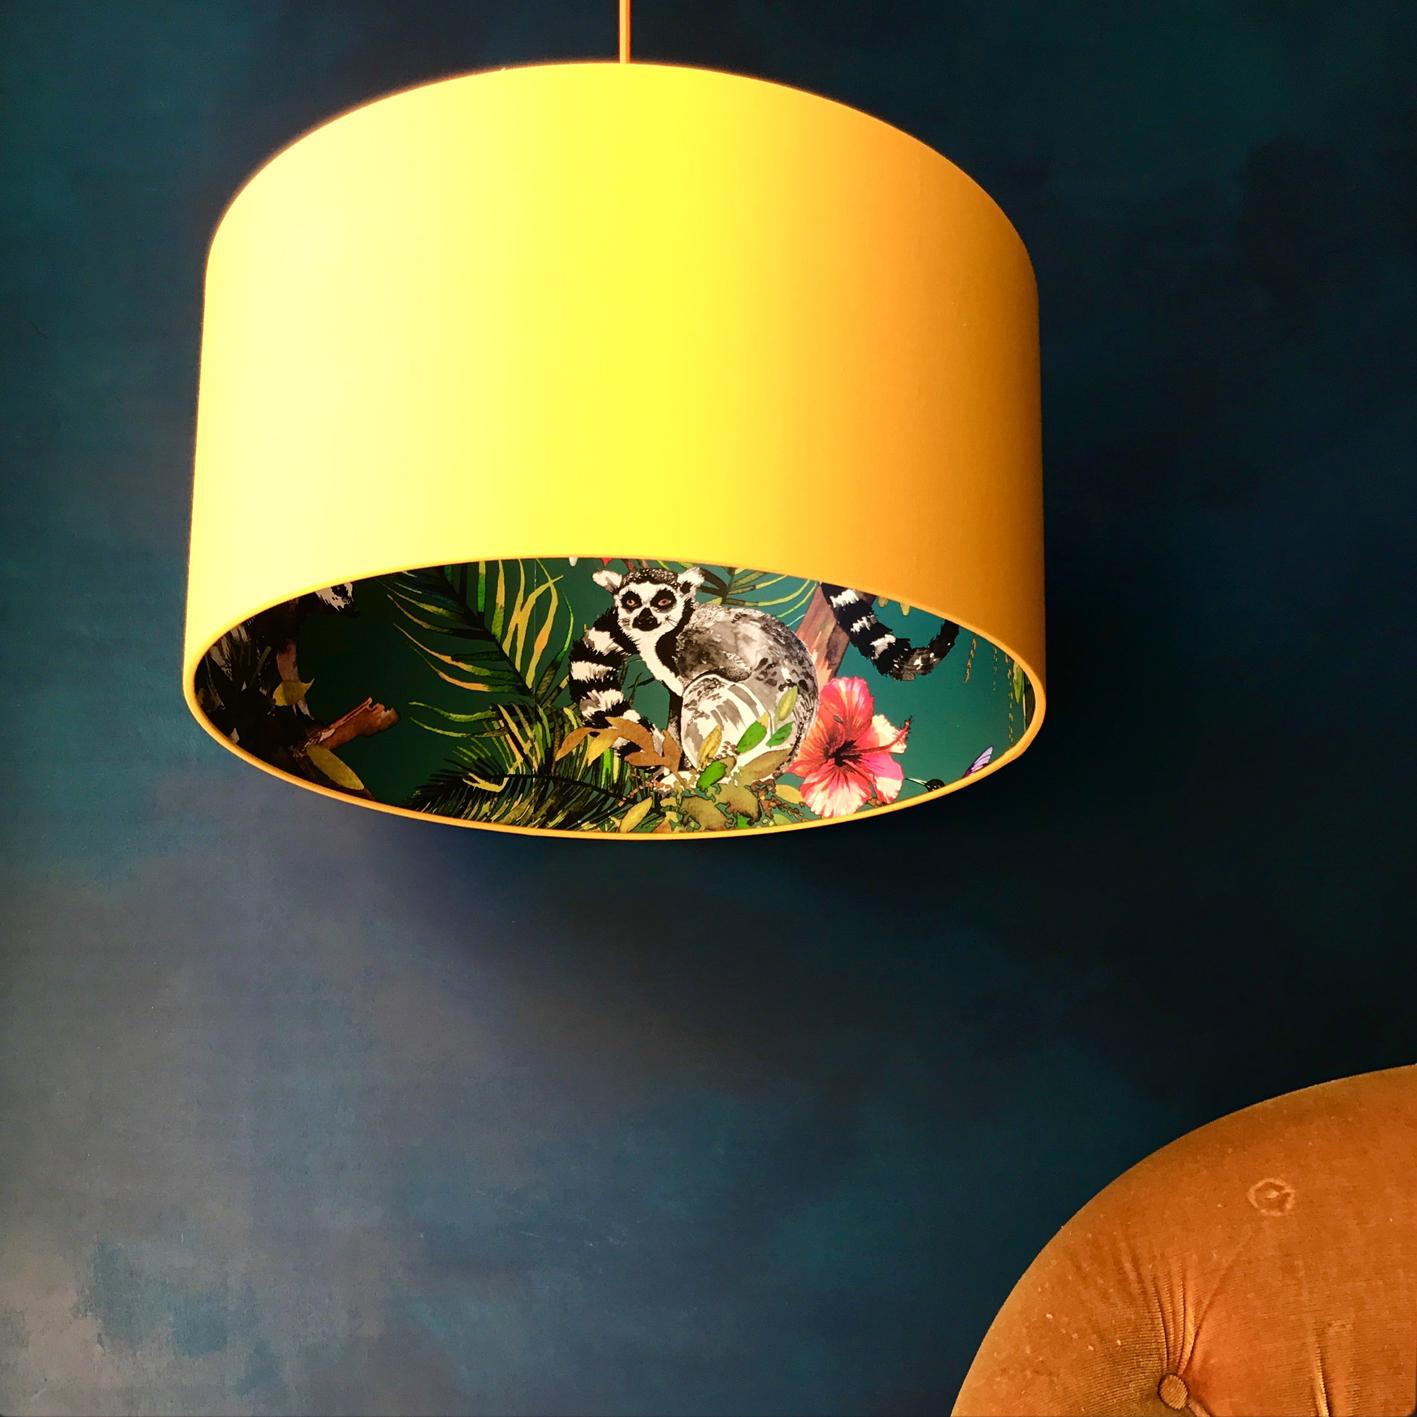 Teal Lemur Silhouette Lampshade in Egg Yolk Yellow